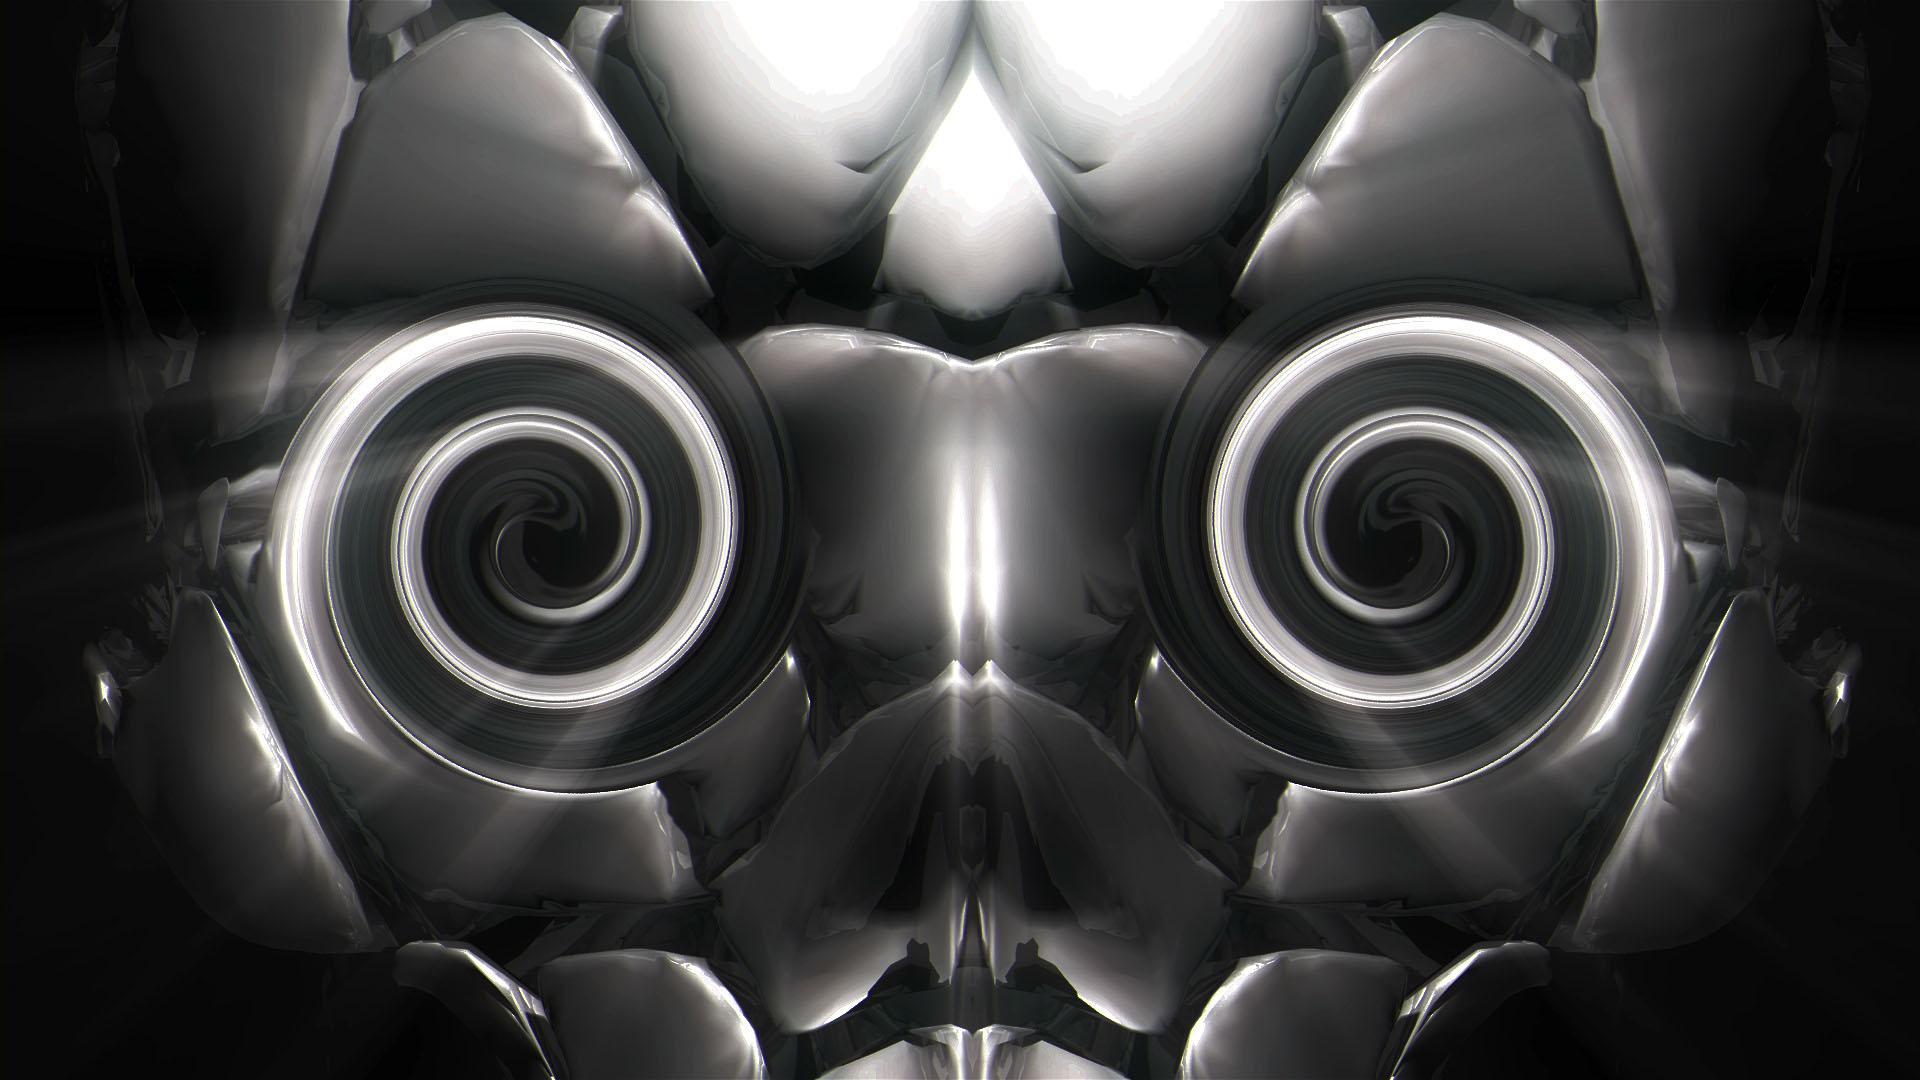 Skull Patterns - Halloween Vj Loops Pack: LIME ART GROUP